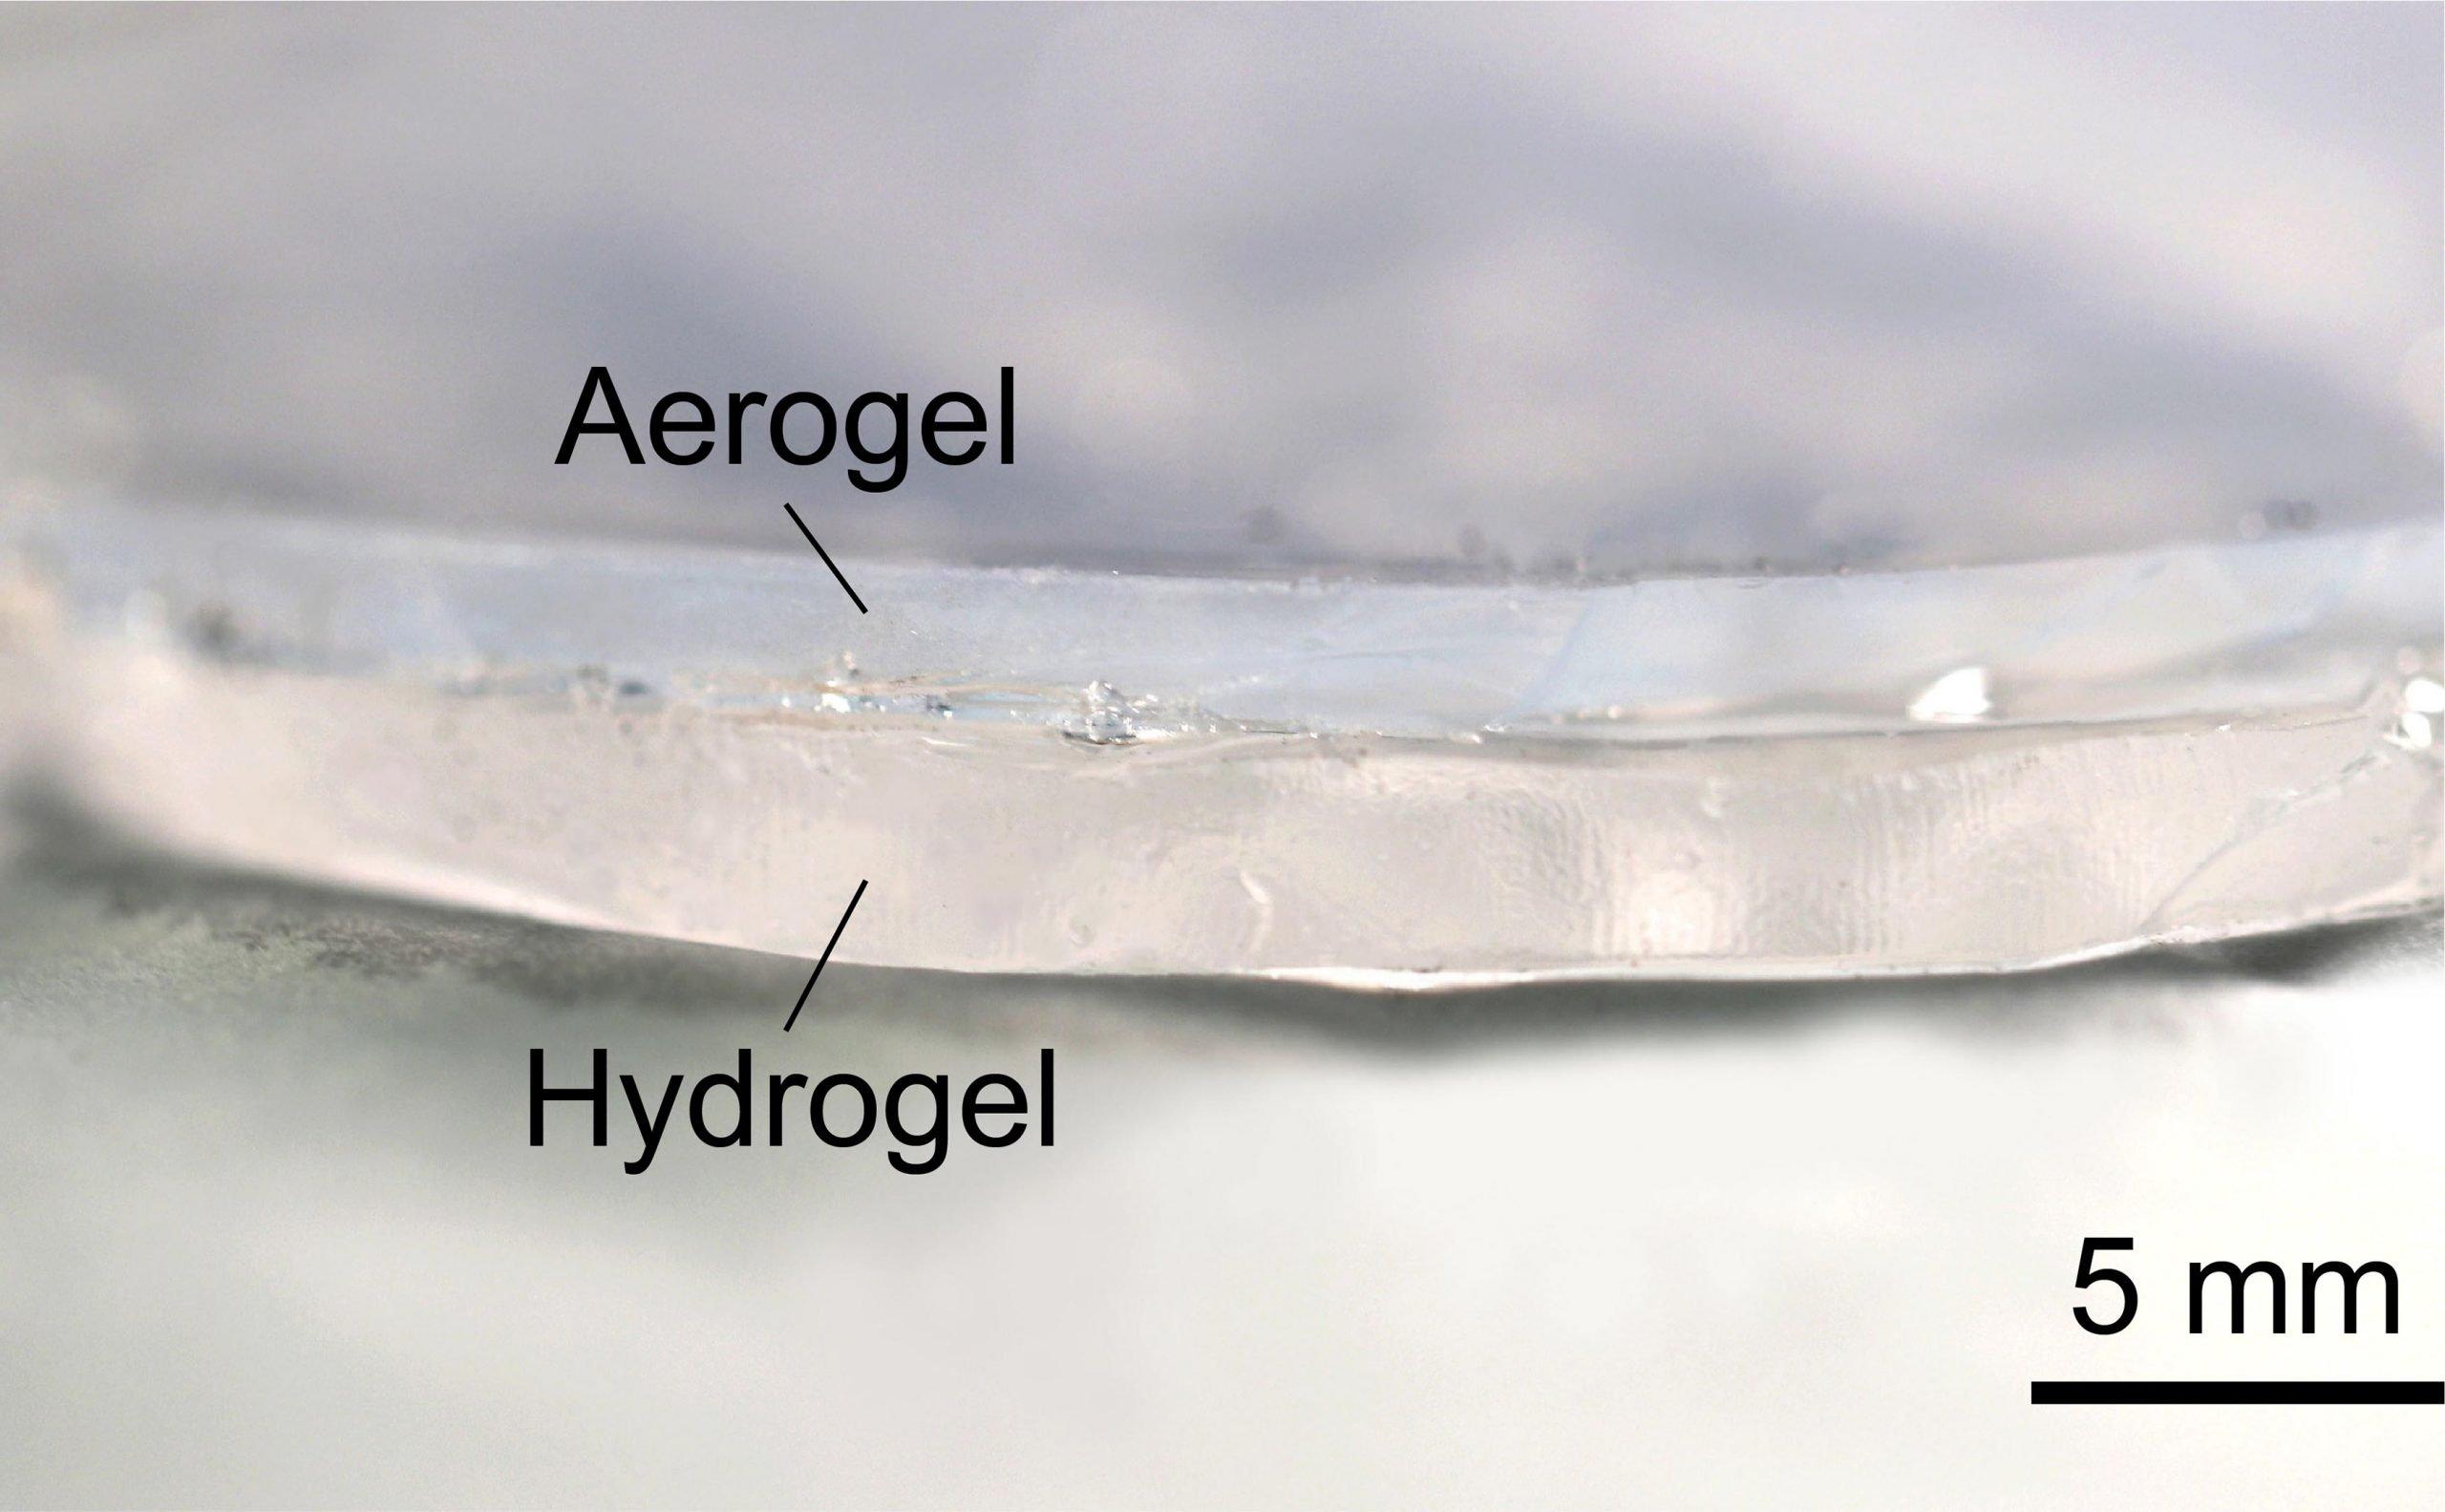 Transparent Hydrogel Aerogel Cooling Bilayer Labeled scaled محققان با الهام از کوهان شتر ماده خنک کننده بی نیاز از برق ساختند اخبار IT